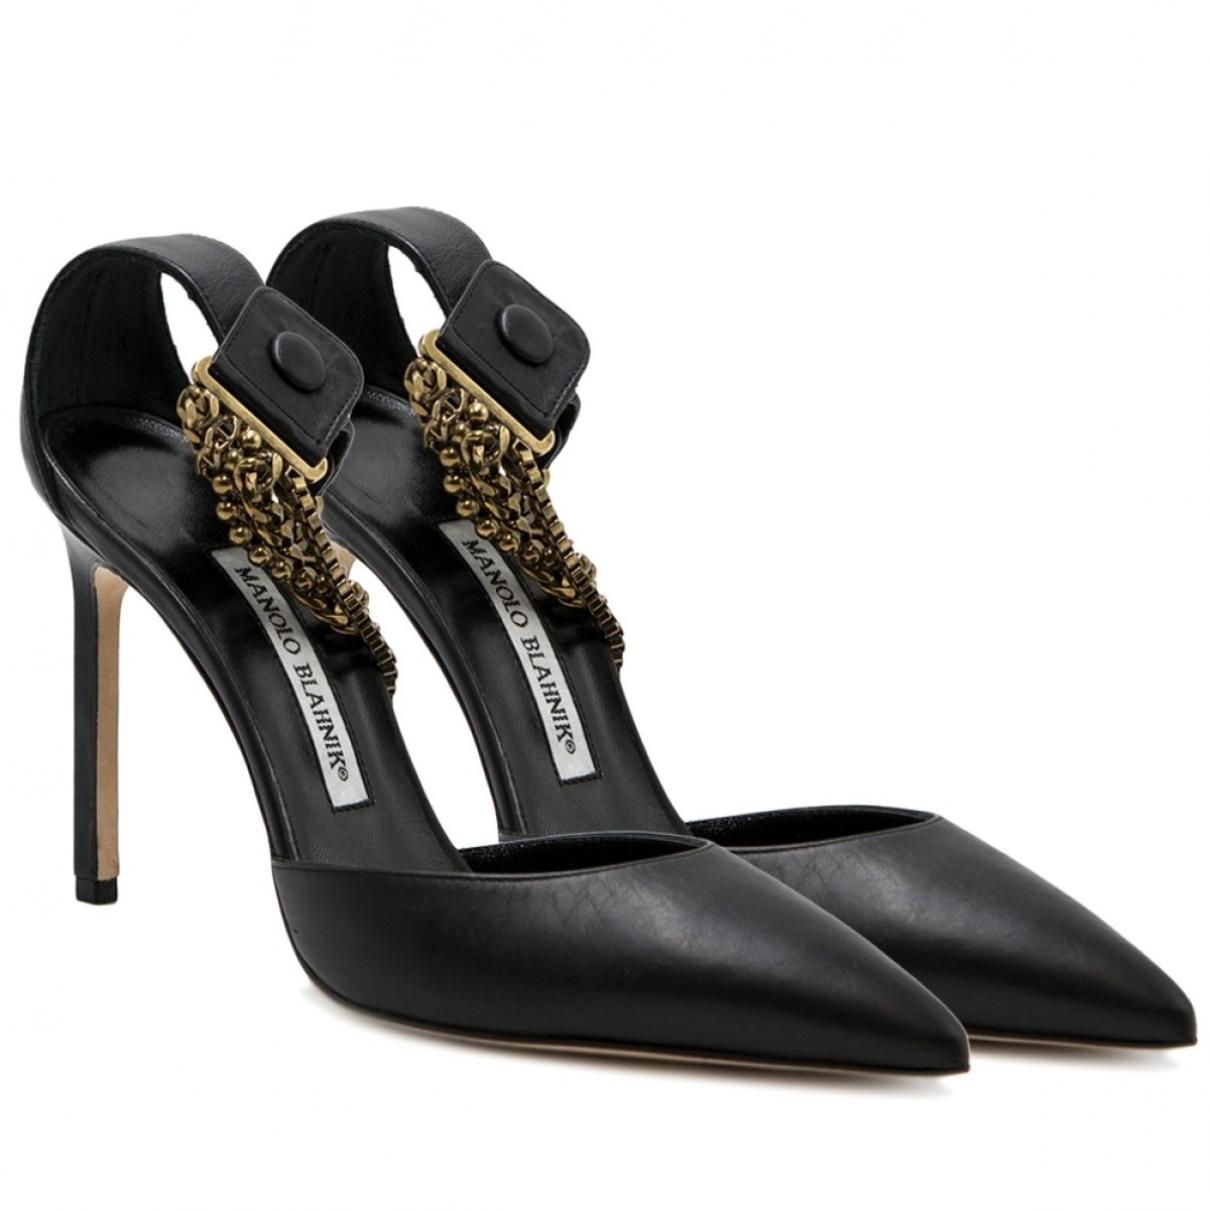 Manolo Blahnik \N Black Leather Sandals for Women 37.5 EU